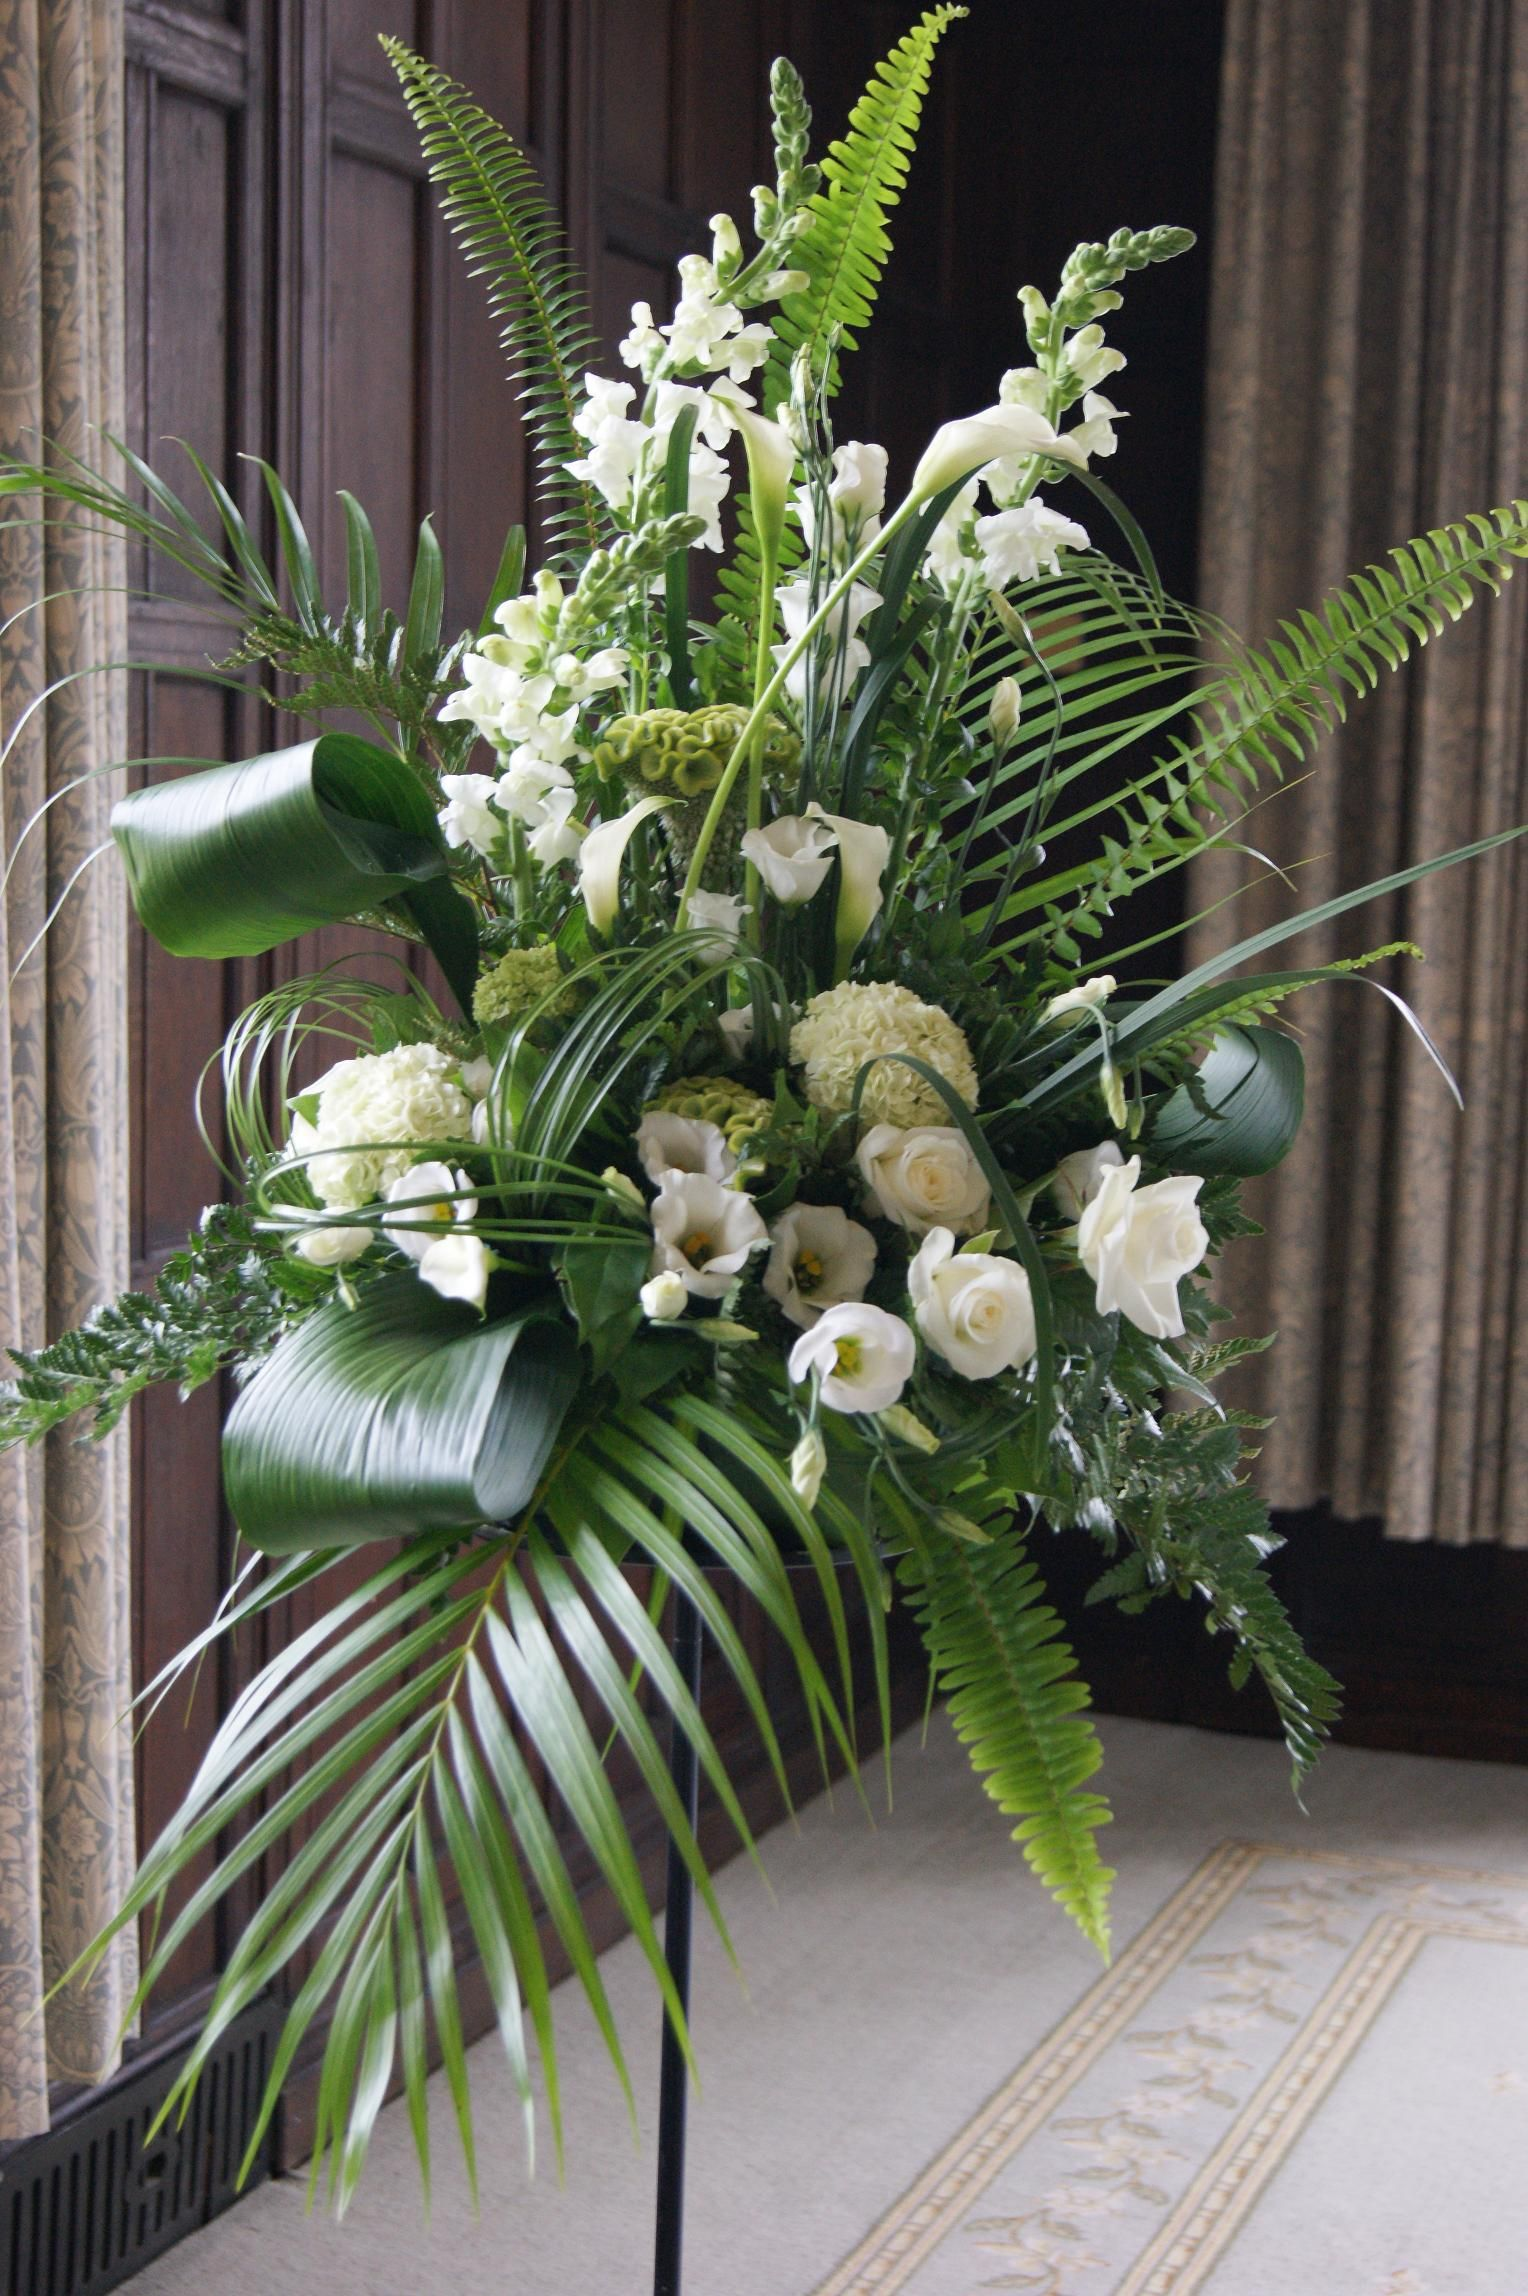 Wedding Flowers Ideas Colorful Spring Wedding Flower ... |Large Spring Floral Arrangements